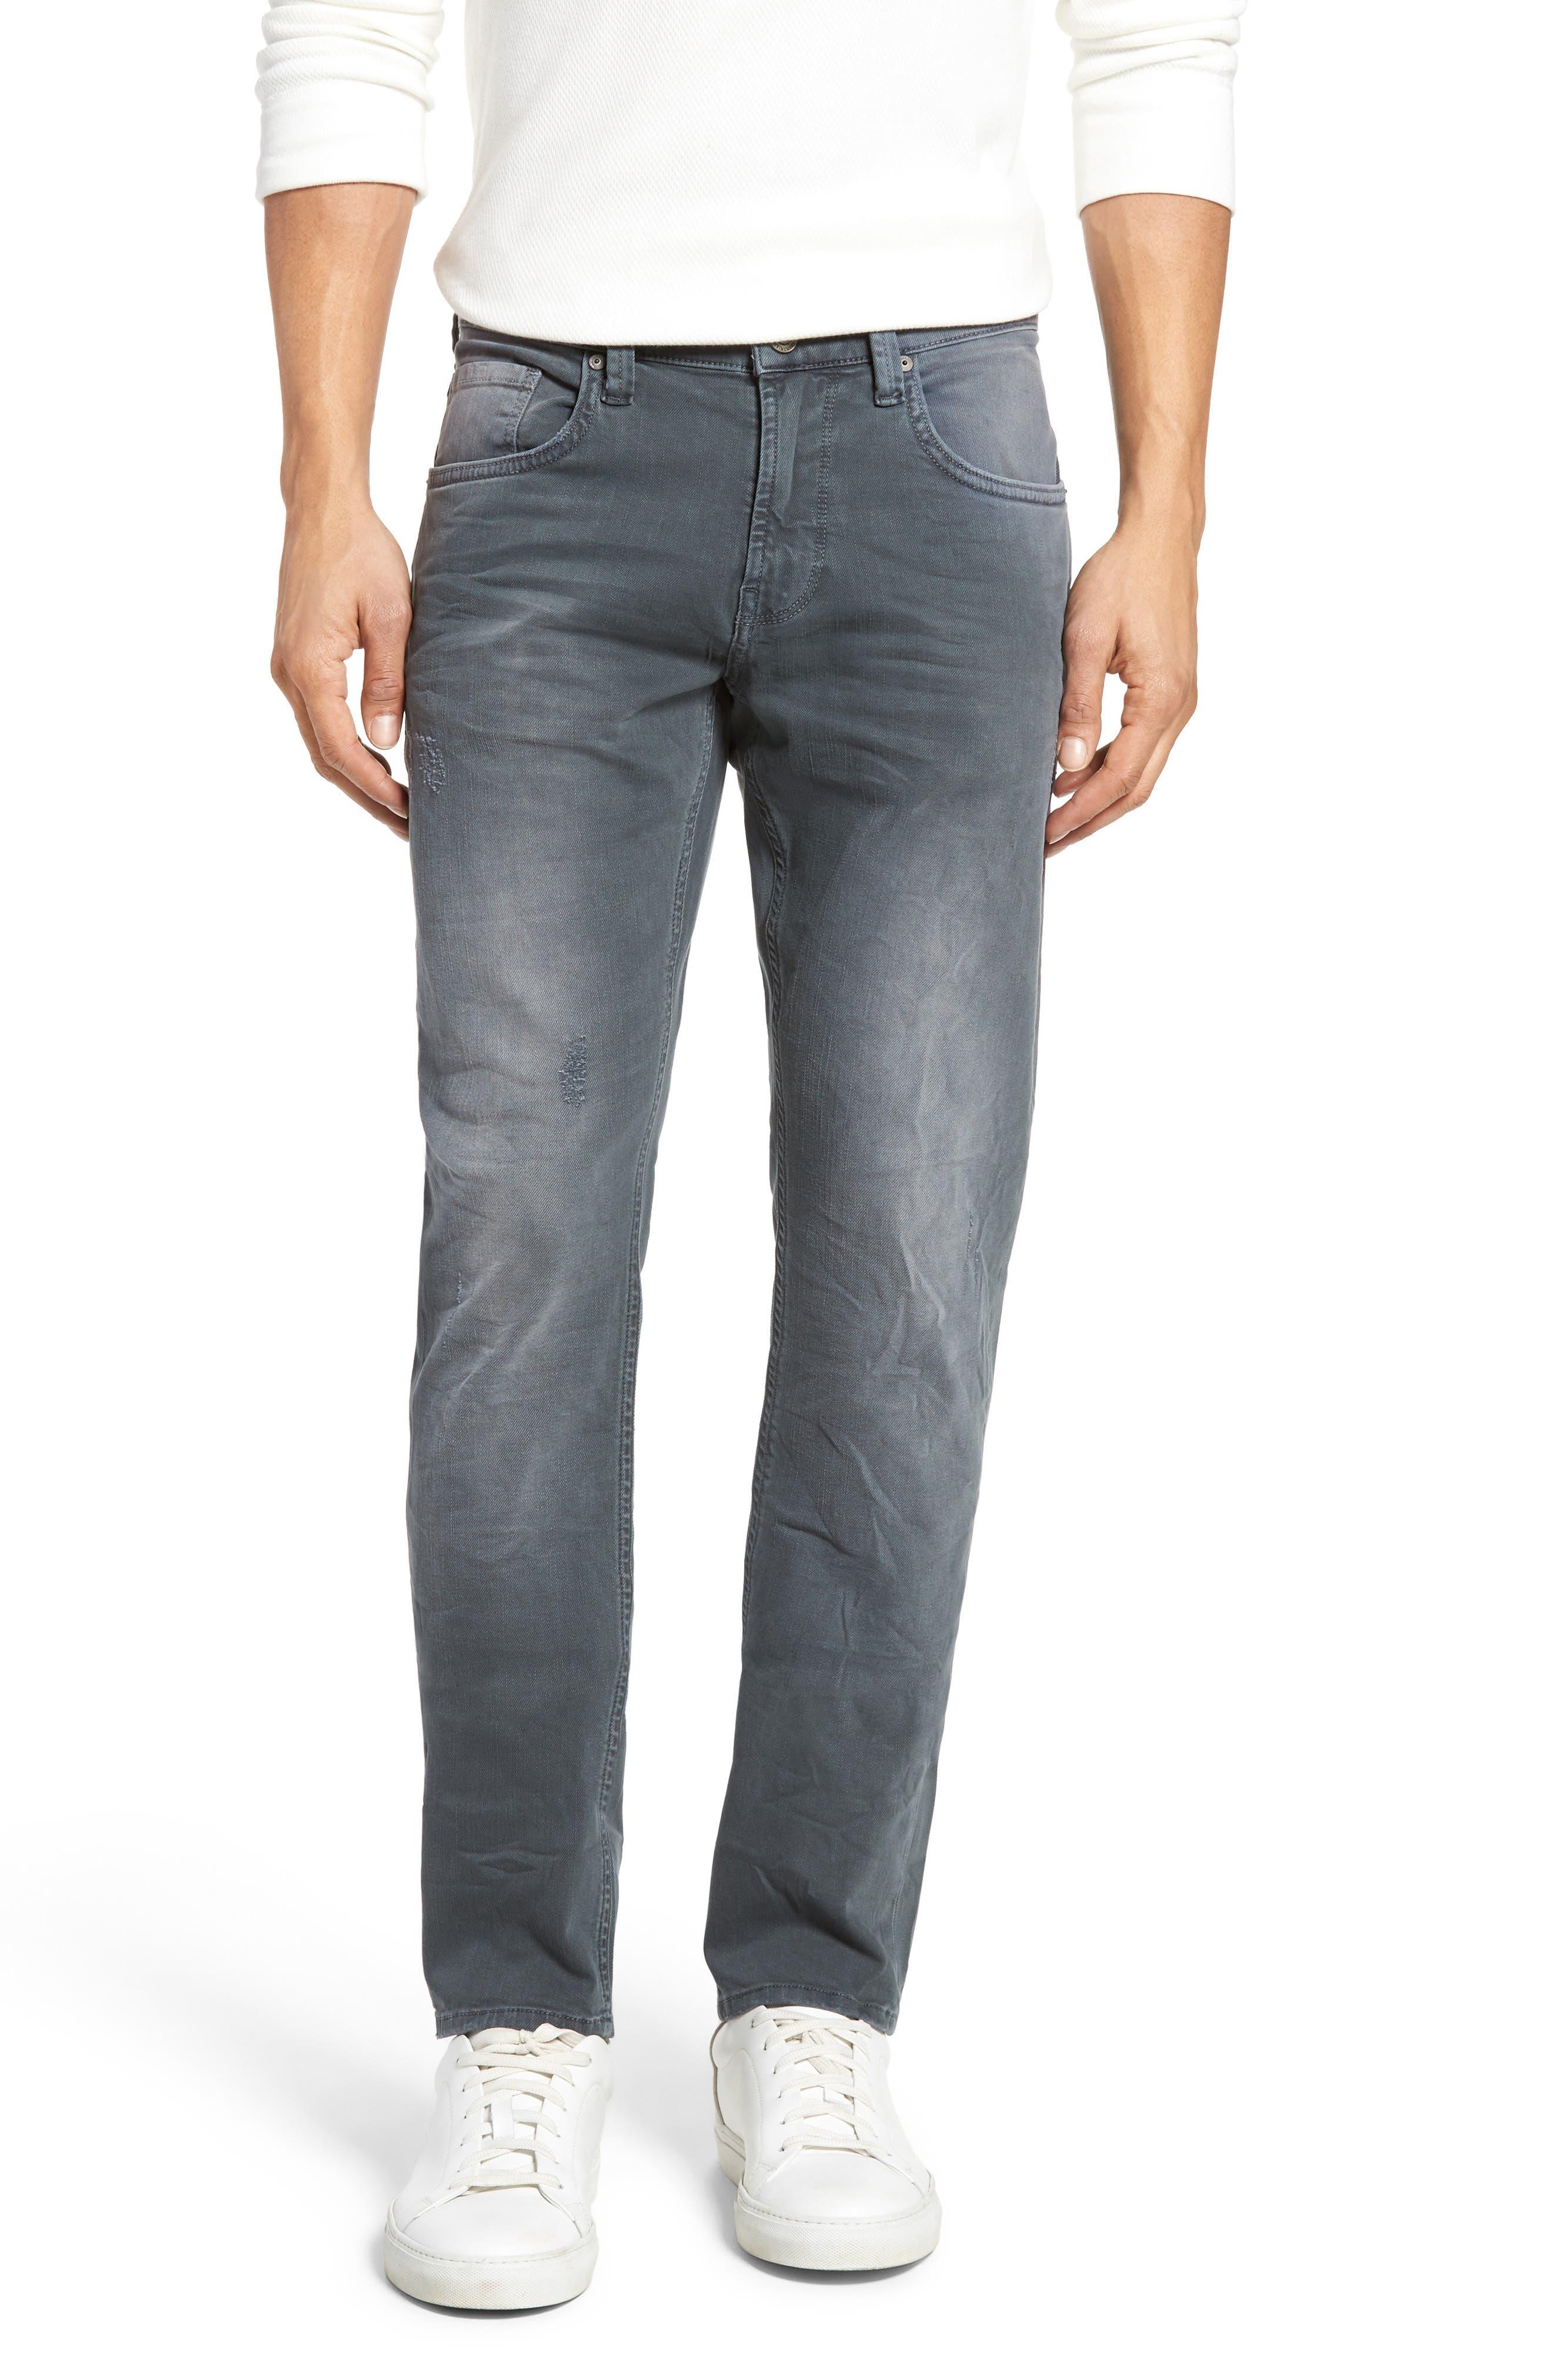 Mavi Jeans Jake Slim Fit Jeans (Green Grey)